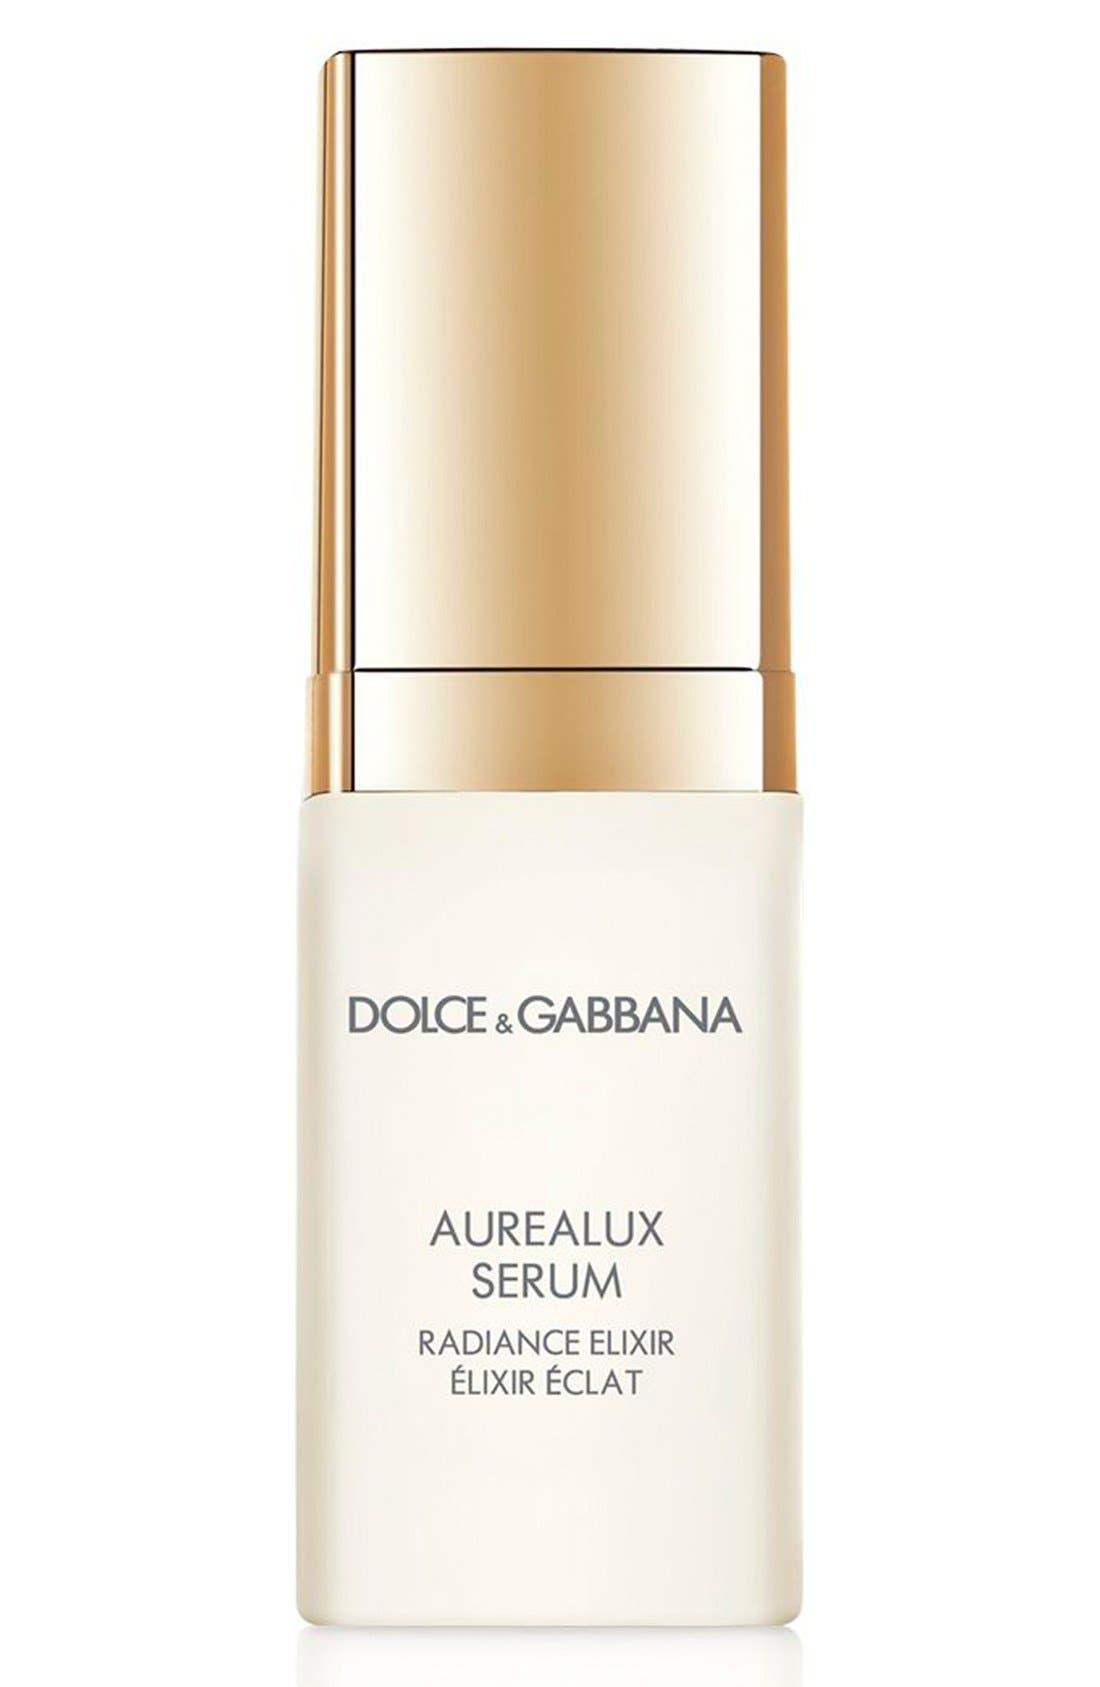 Dolce&GabbanaBeauty 'Aurealux' Serum Radiance Elixir,                             Main thumbnail 1, color,                             000